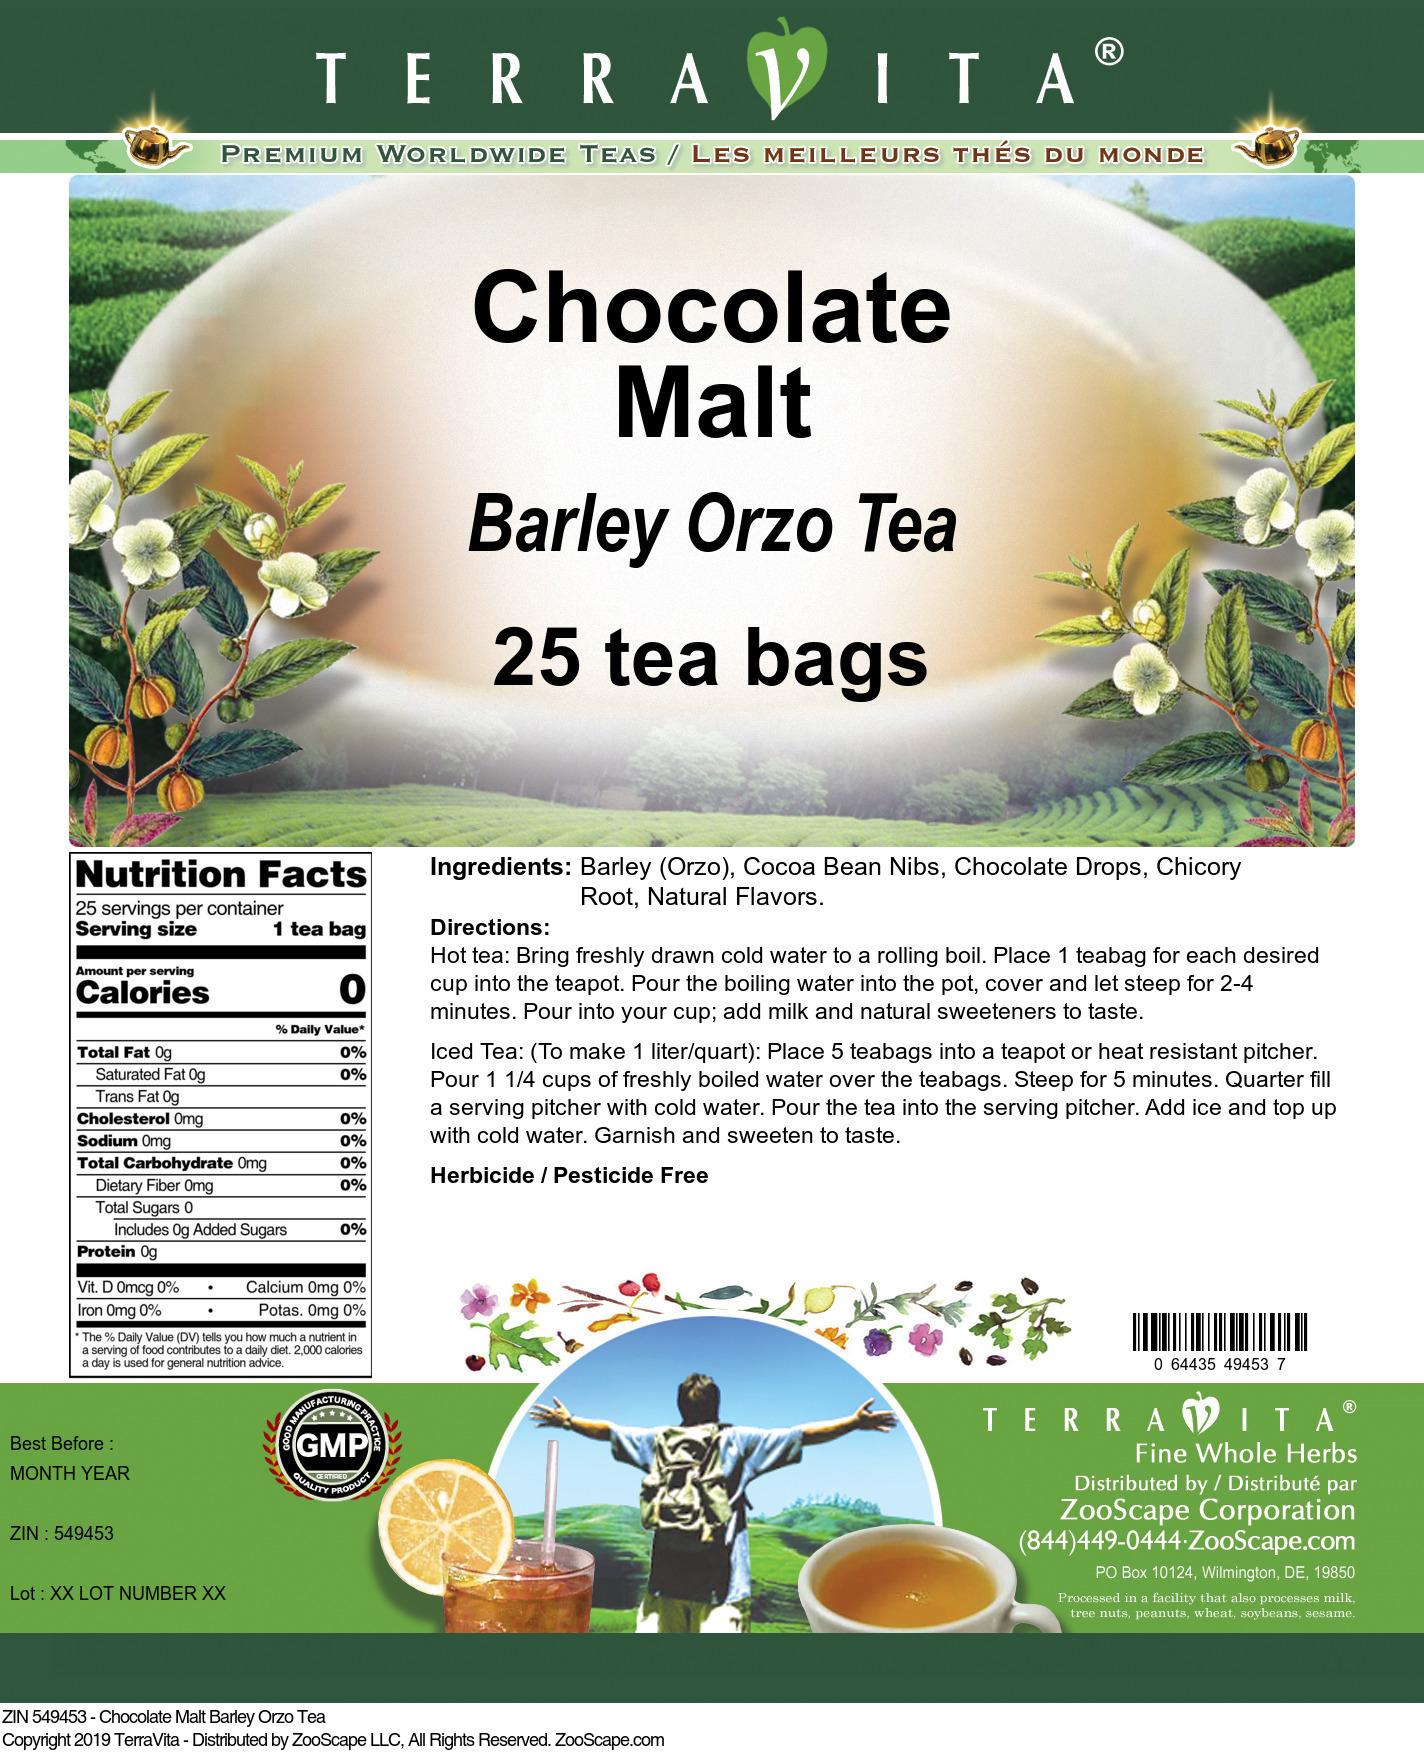 Chocolate Malt Barley Orzo